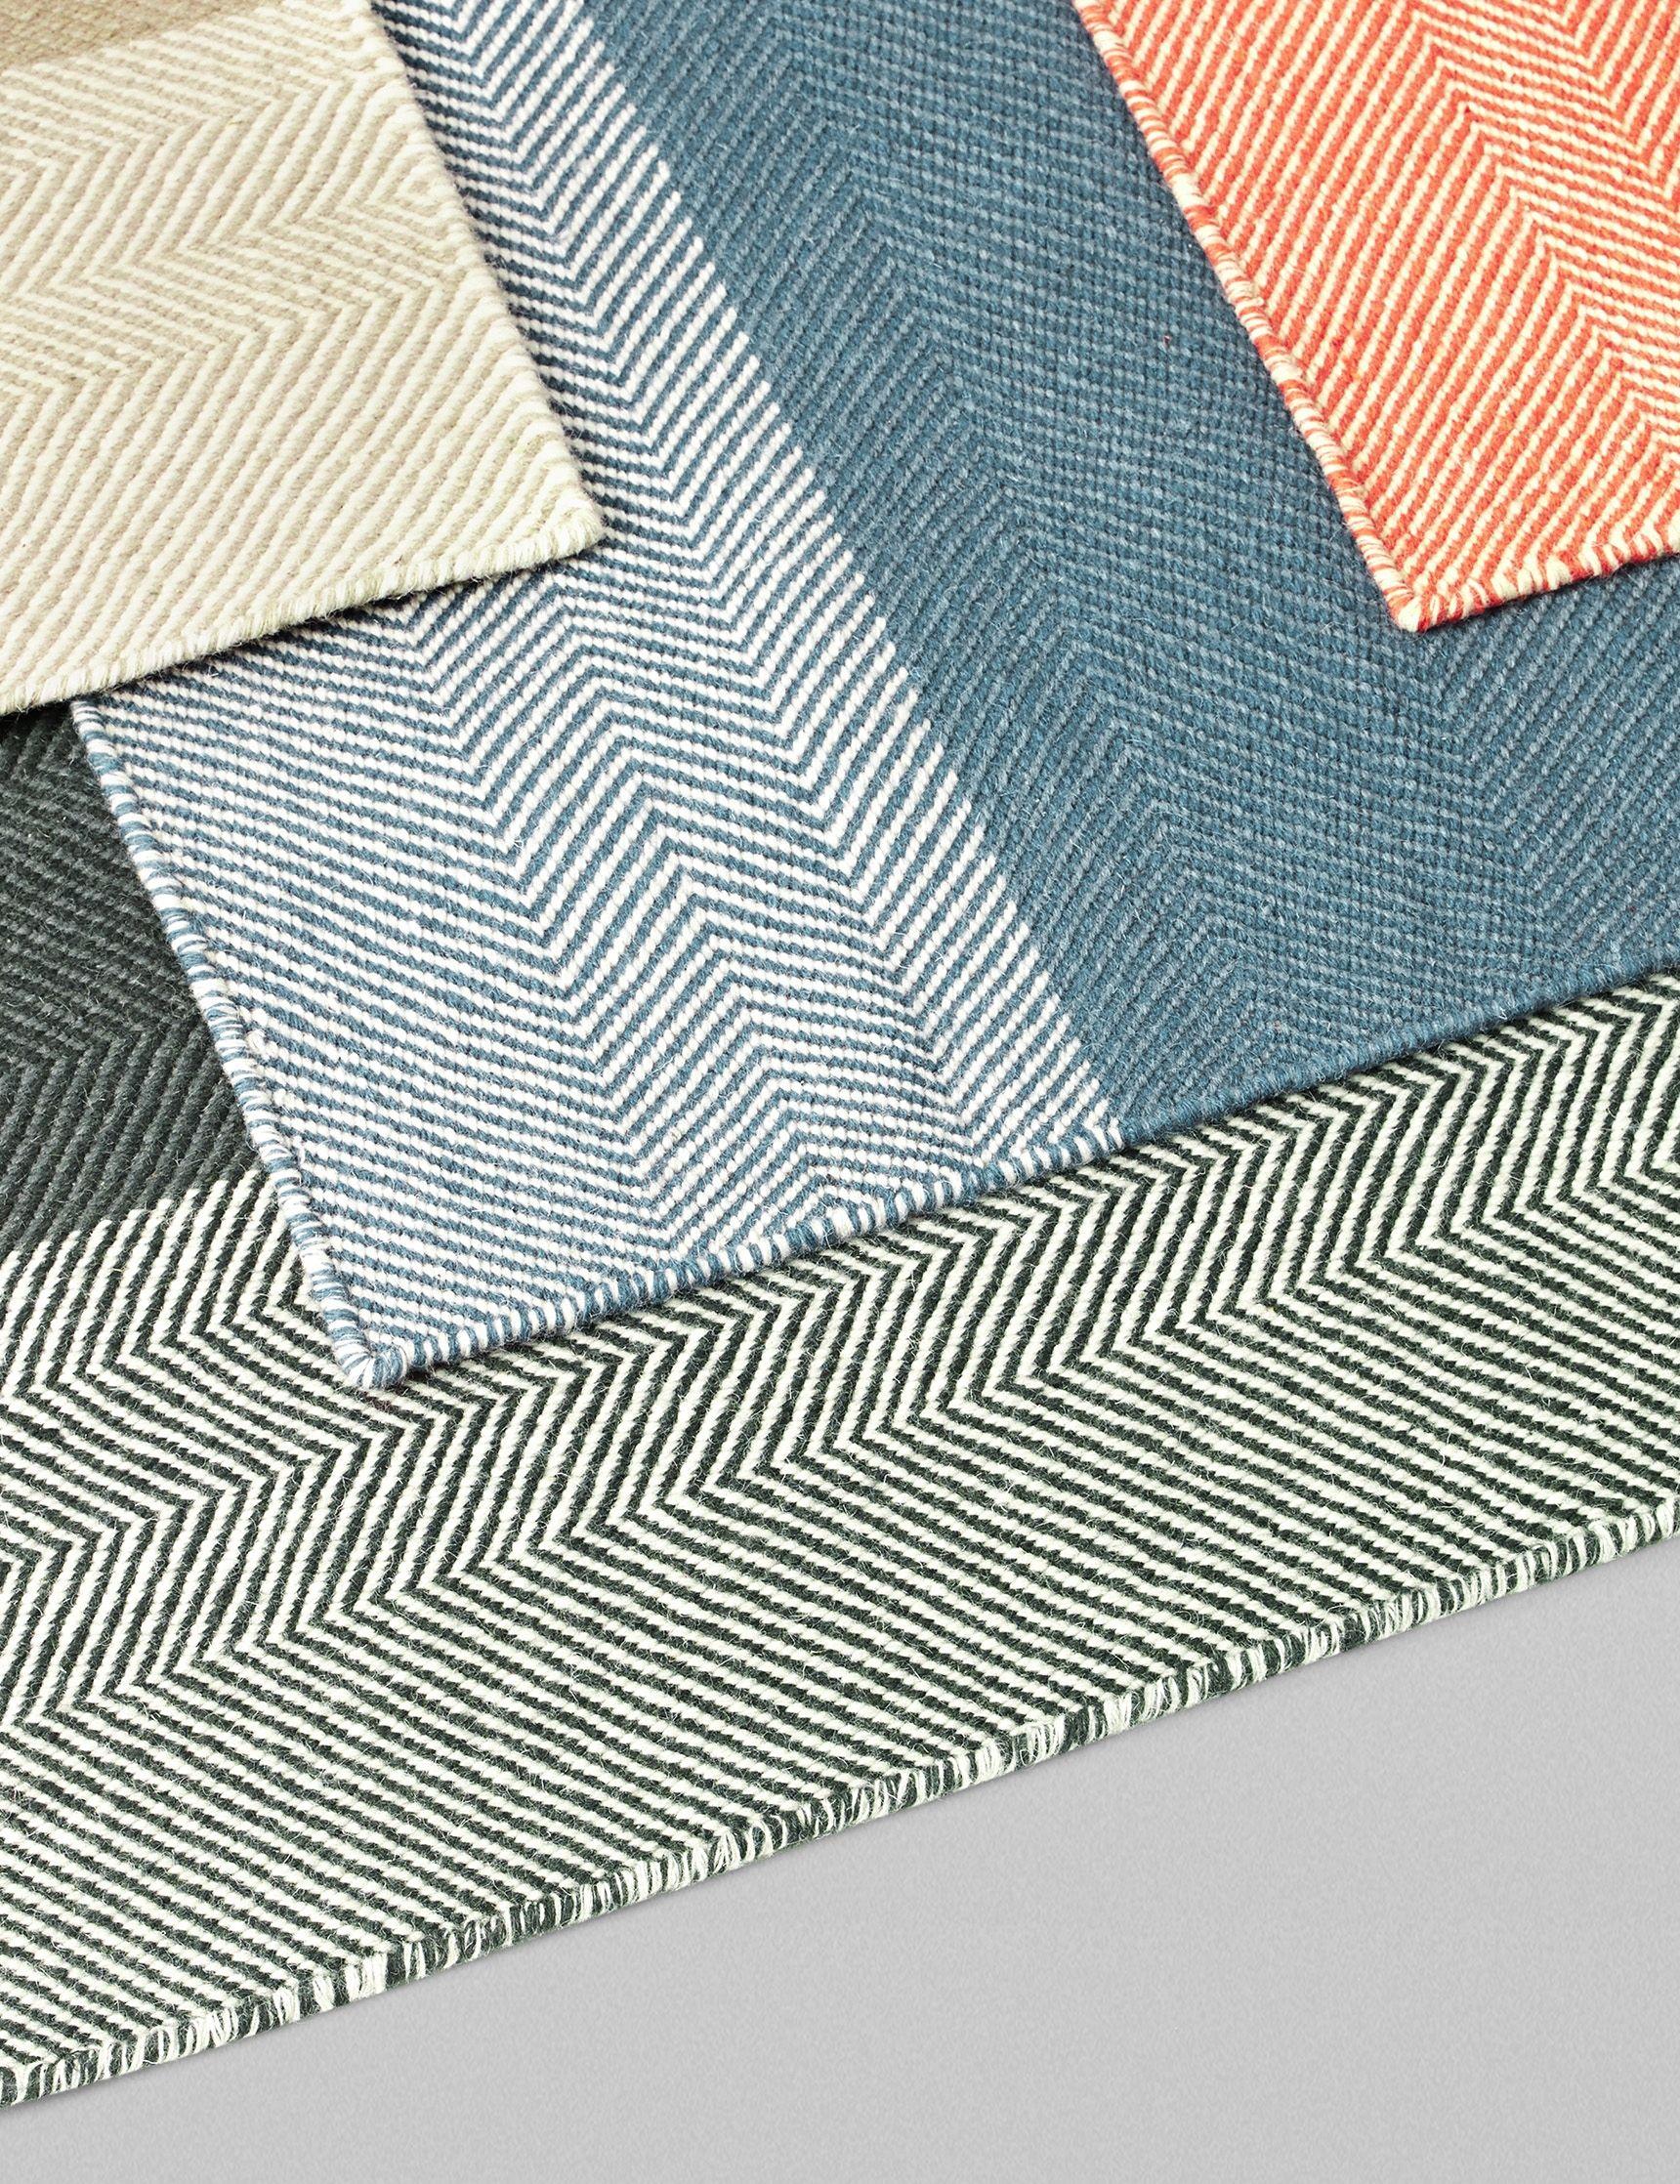 Pin By Irene Z On I N T E R I O R Scandinavian Textiles Rugs On Carpet Scandinavian Furniture Design